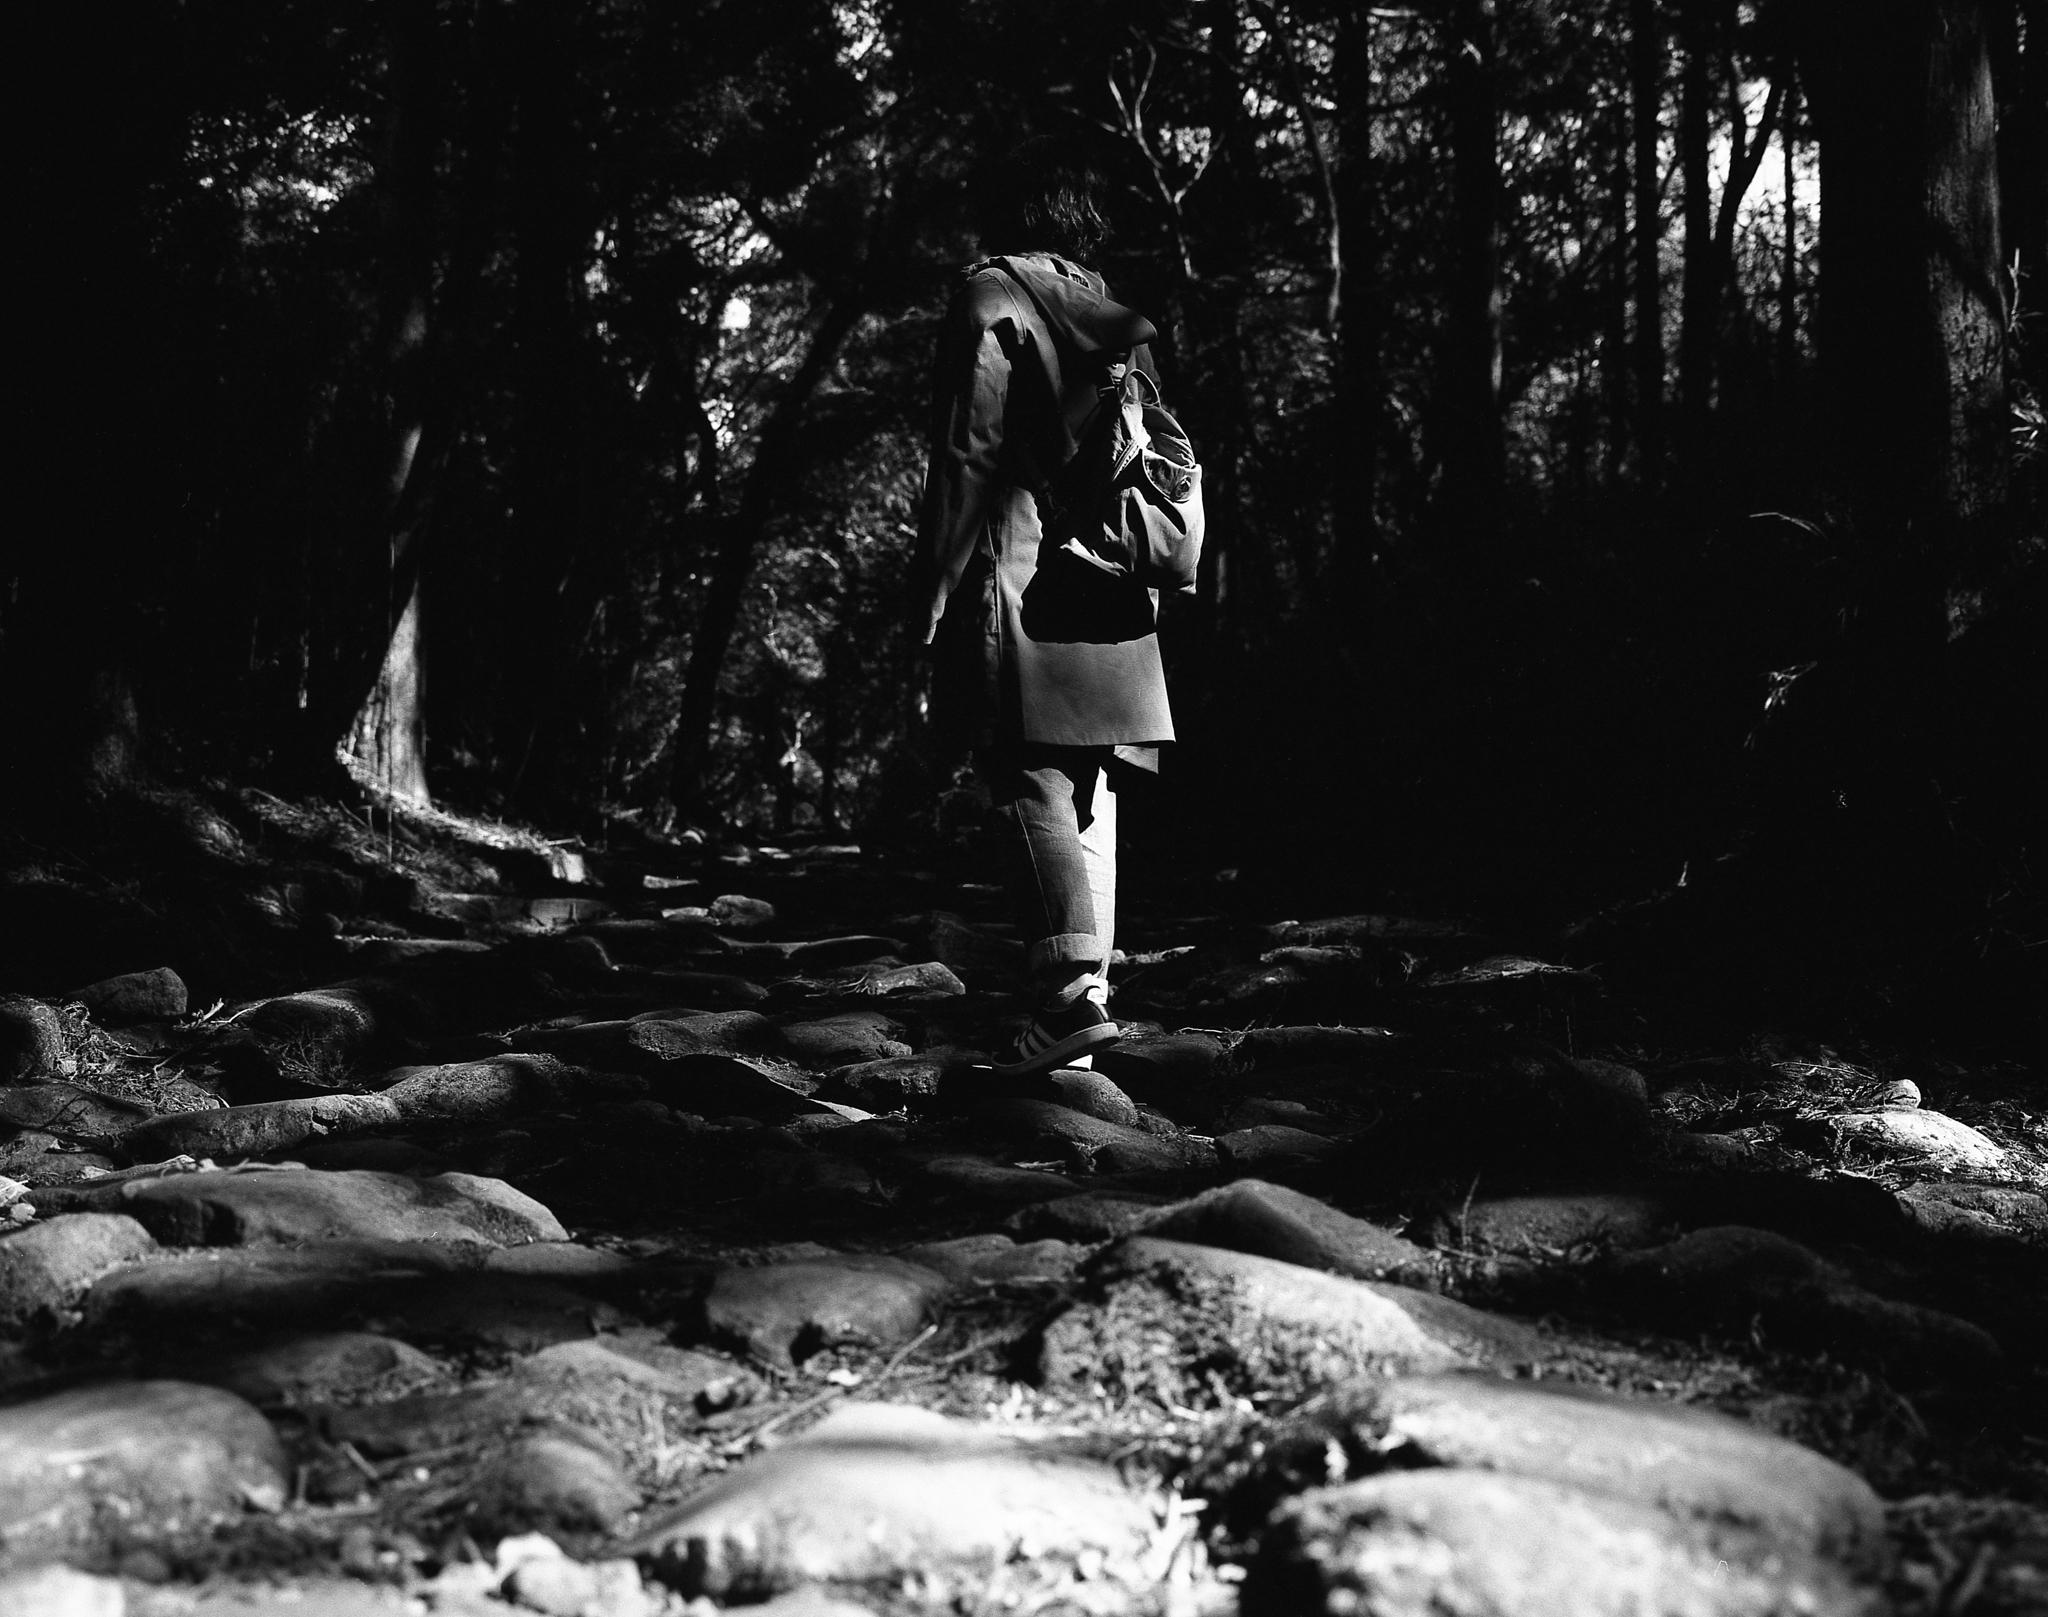 Hiking the ancient Edo trail (Mamiya 7ii Ilford HP5+)